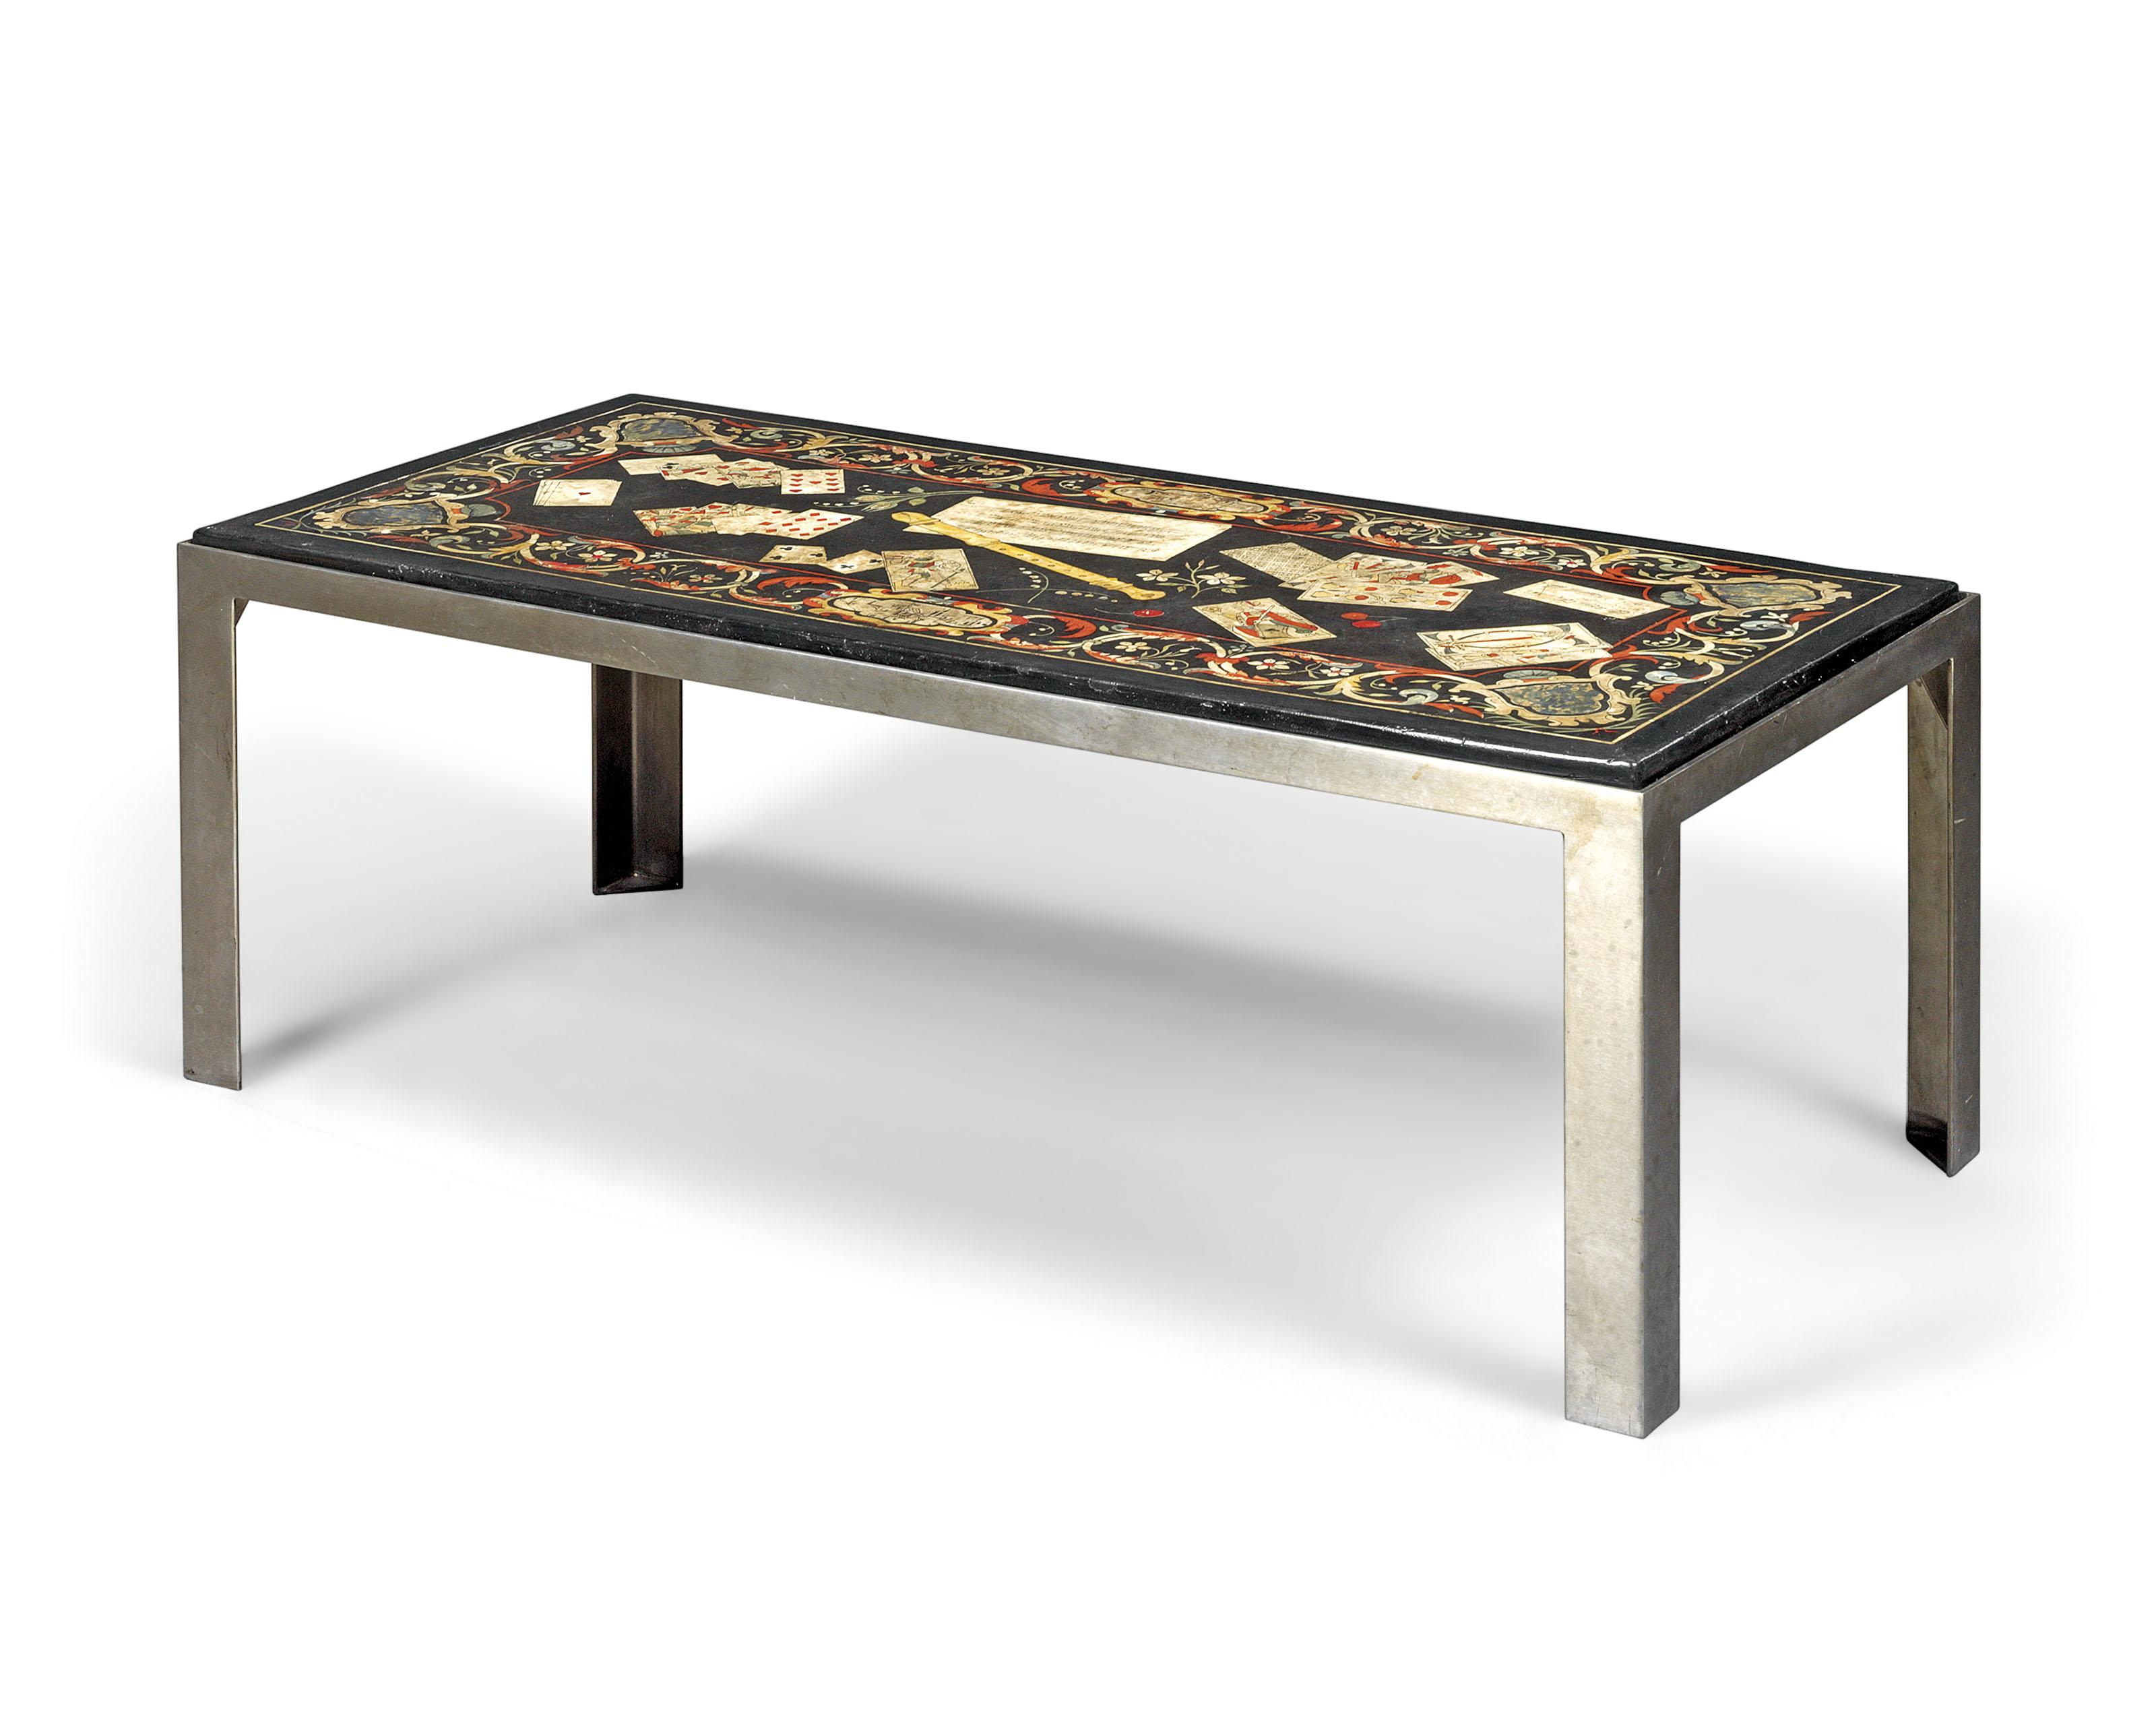 AN ITALIAN SCAGLIOLA TABLE TOP